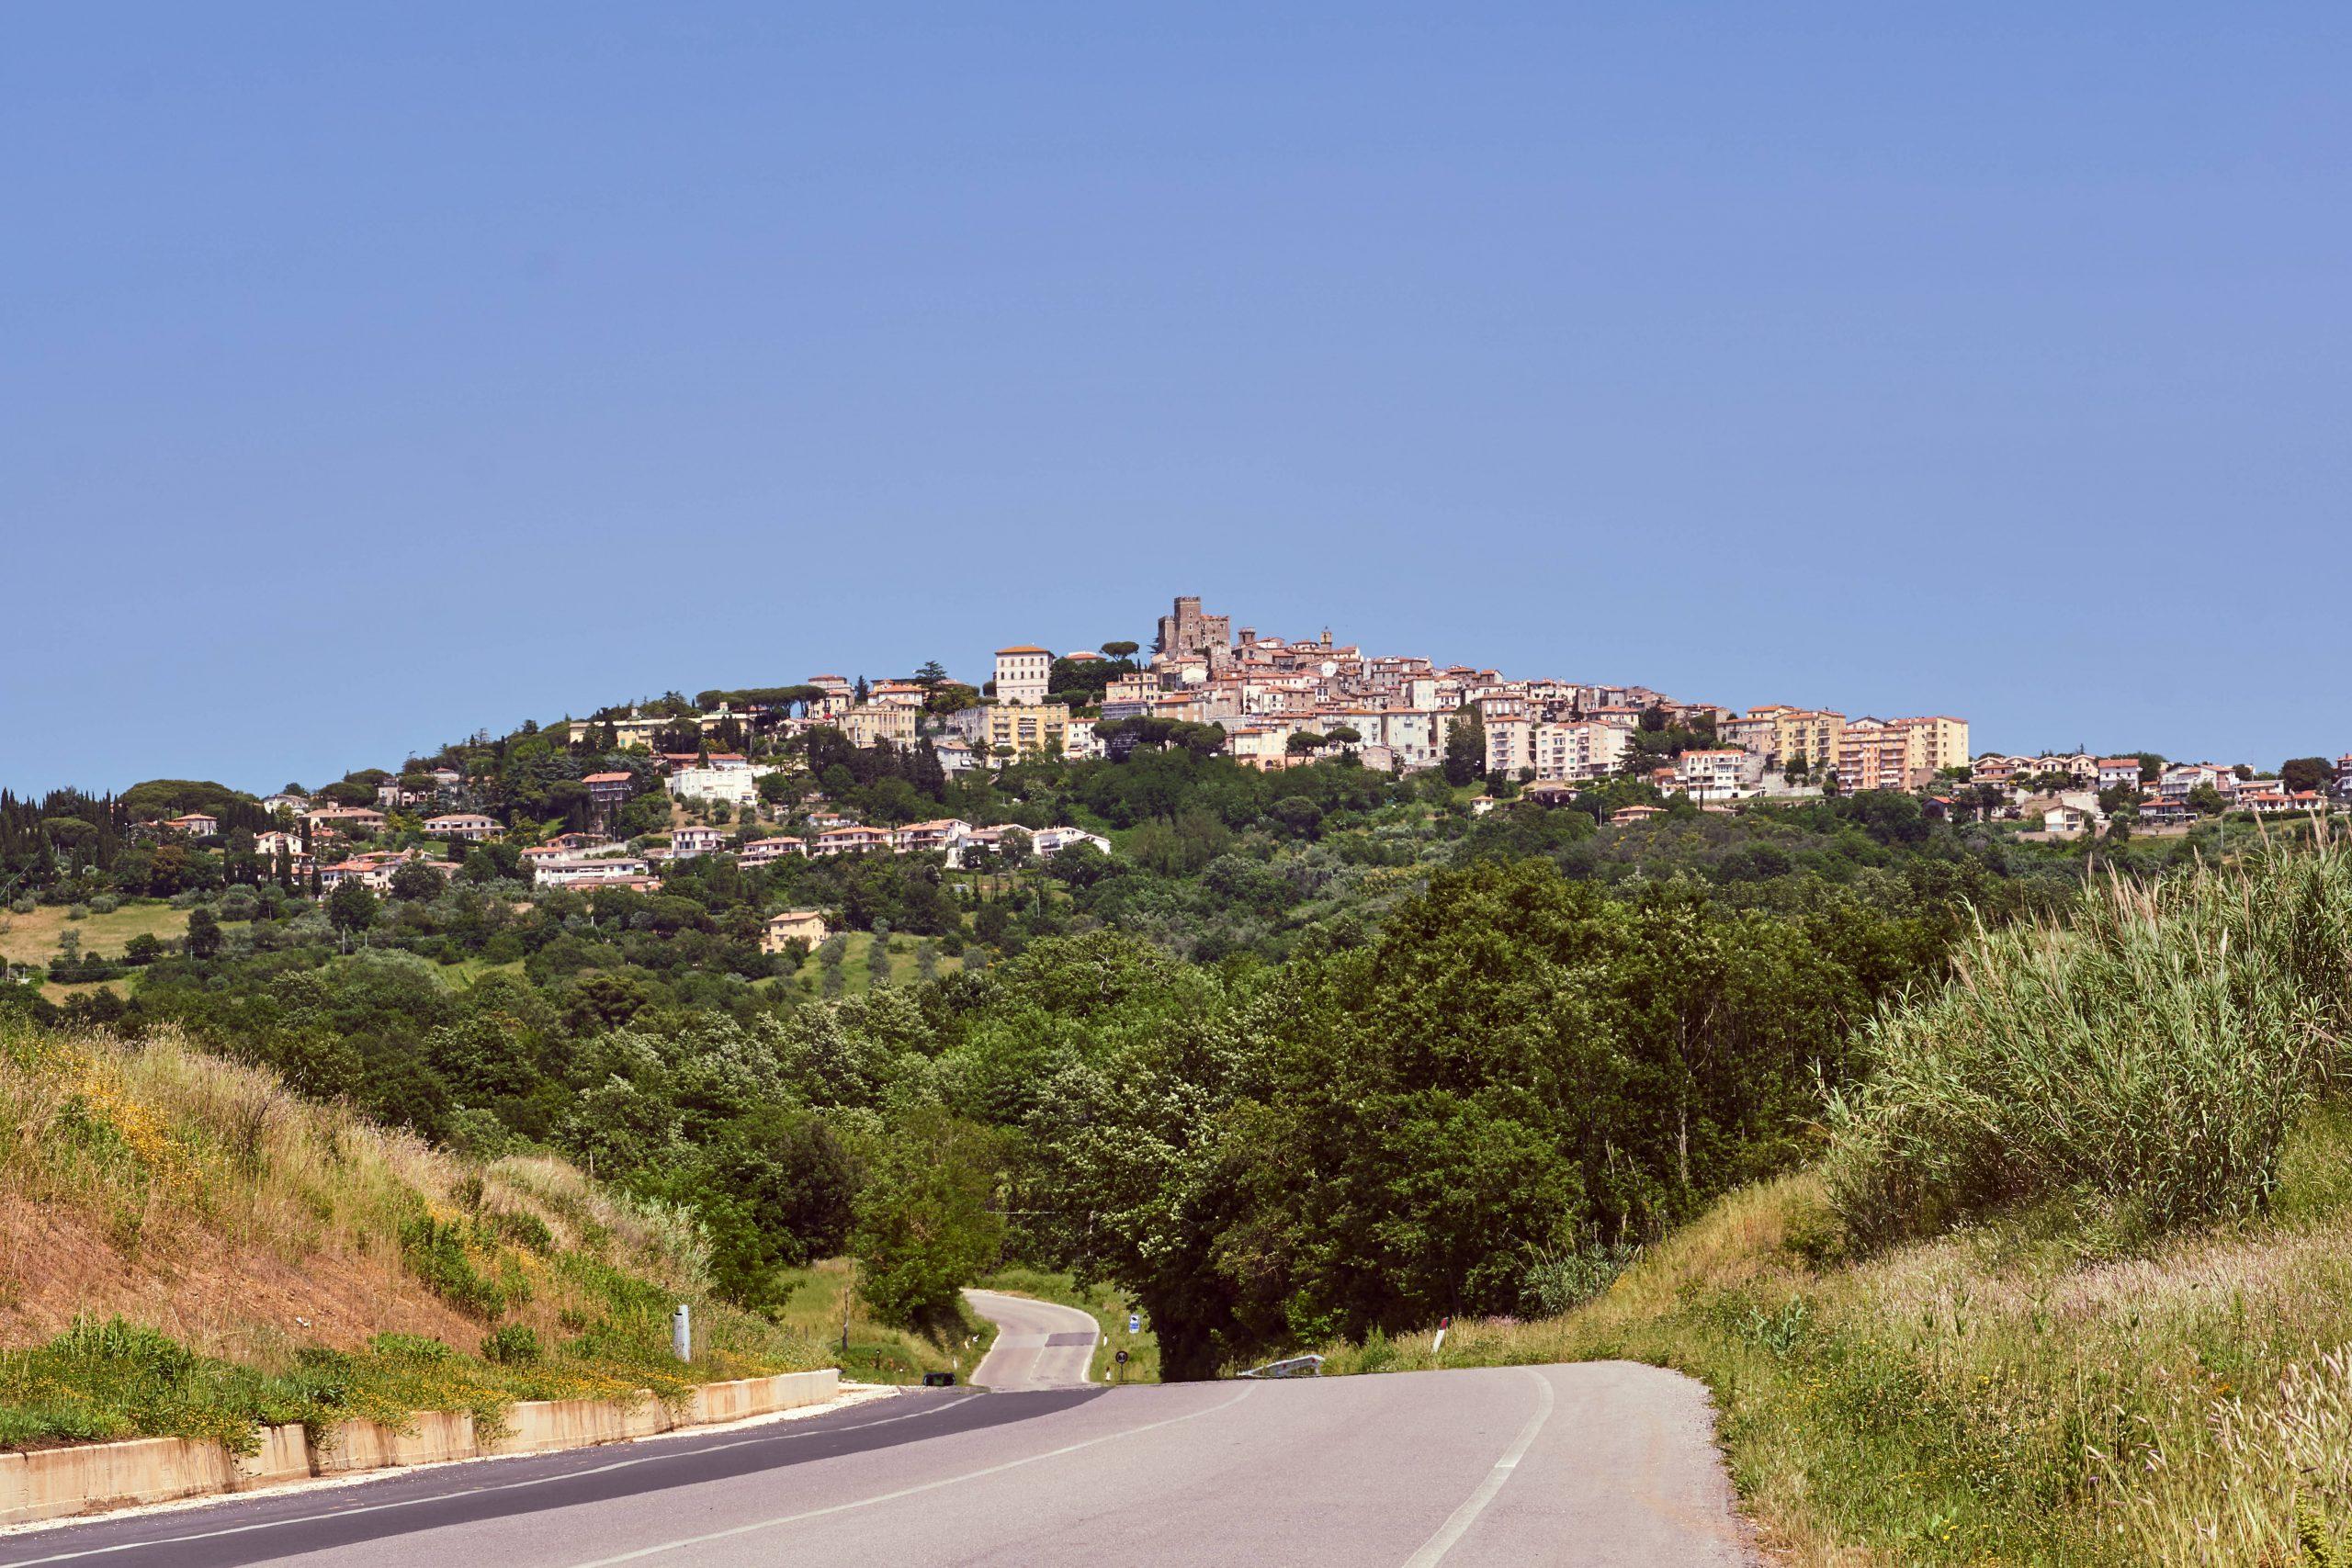 Canva - Asphalt road to the city of Manciano in Tuscany